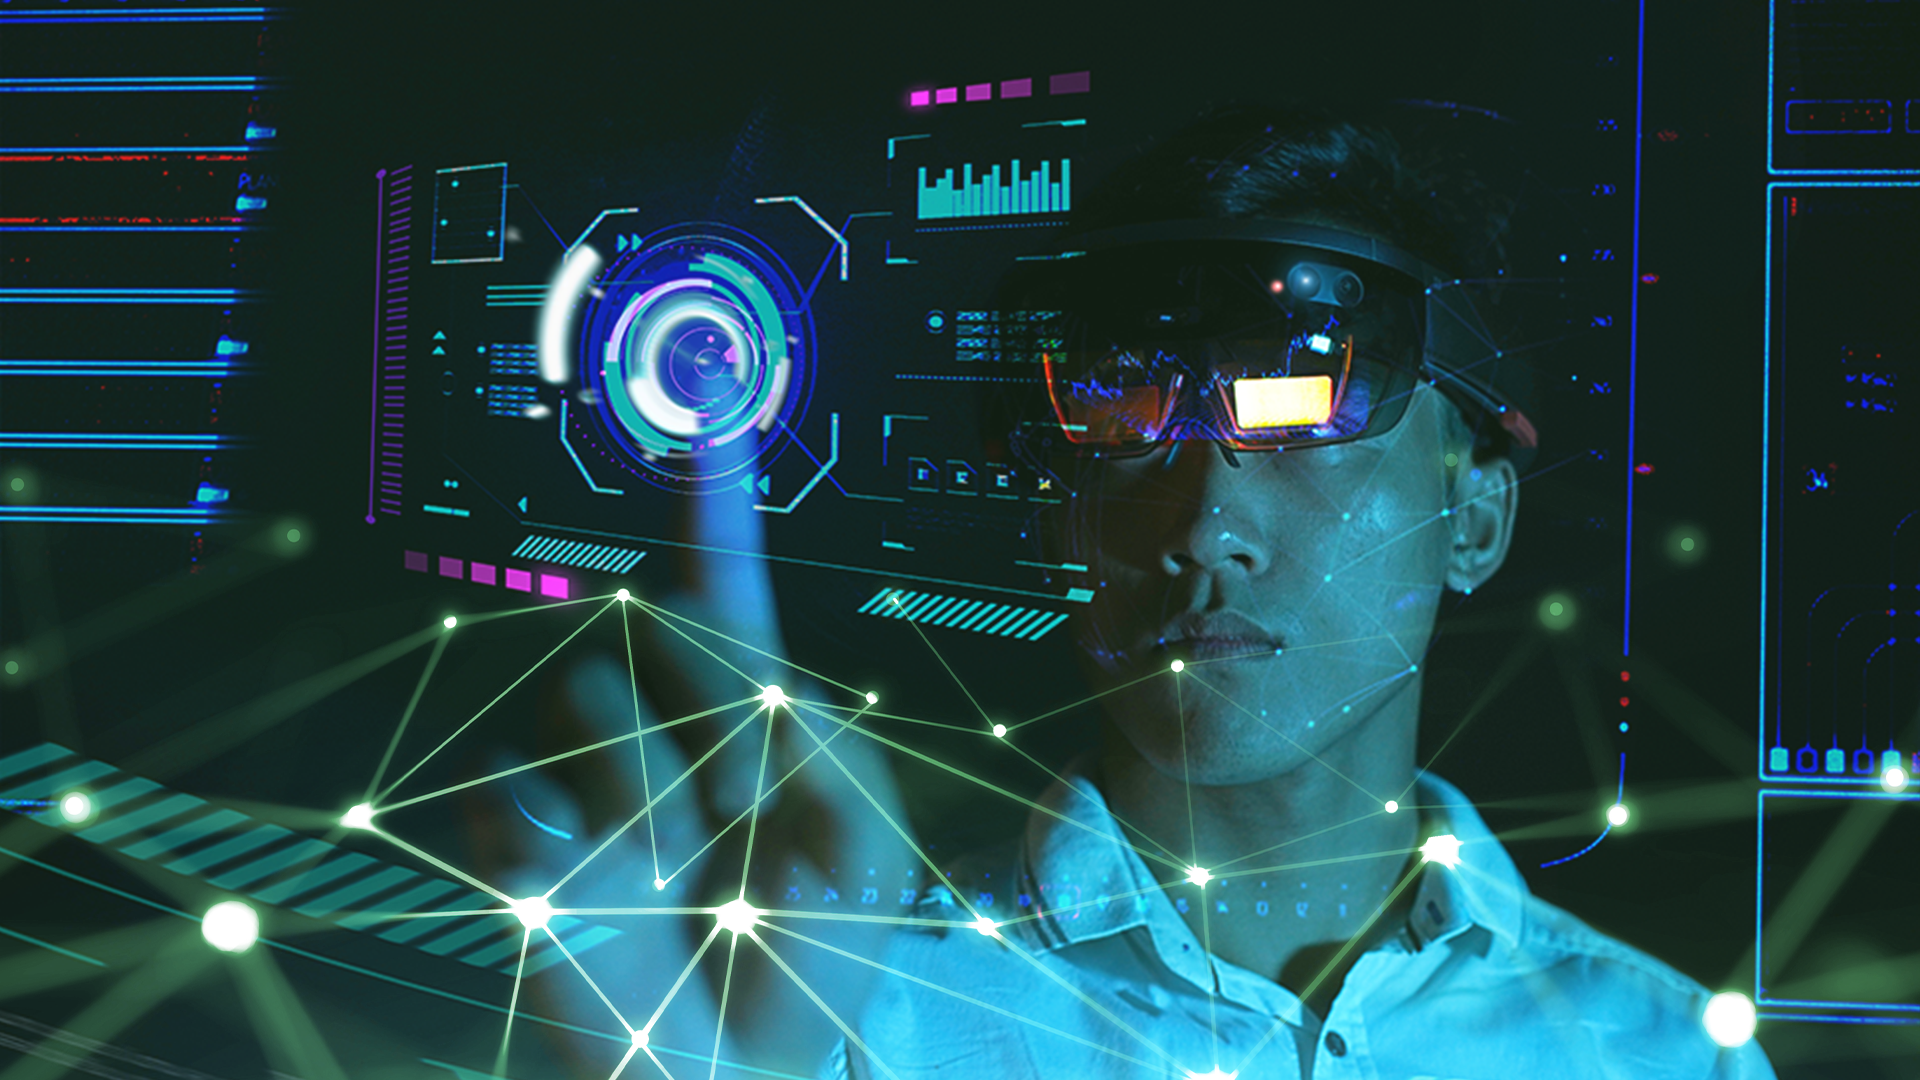 Internet, Sicherheit, Virtual Reality, VR, Augmented Reality, Headset, Augmented-Reality, HoloLens, AR, VR-Brille, VR-Headset, Microsoft HoloLens, Mixed Reality, Windows Holographic, Windows Mixed Reality, HoloLens 2, Microsoft HoloLense, VR Headset, Argumente, Mixed-Reality